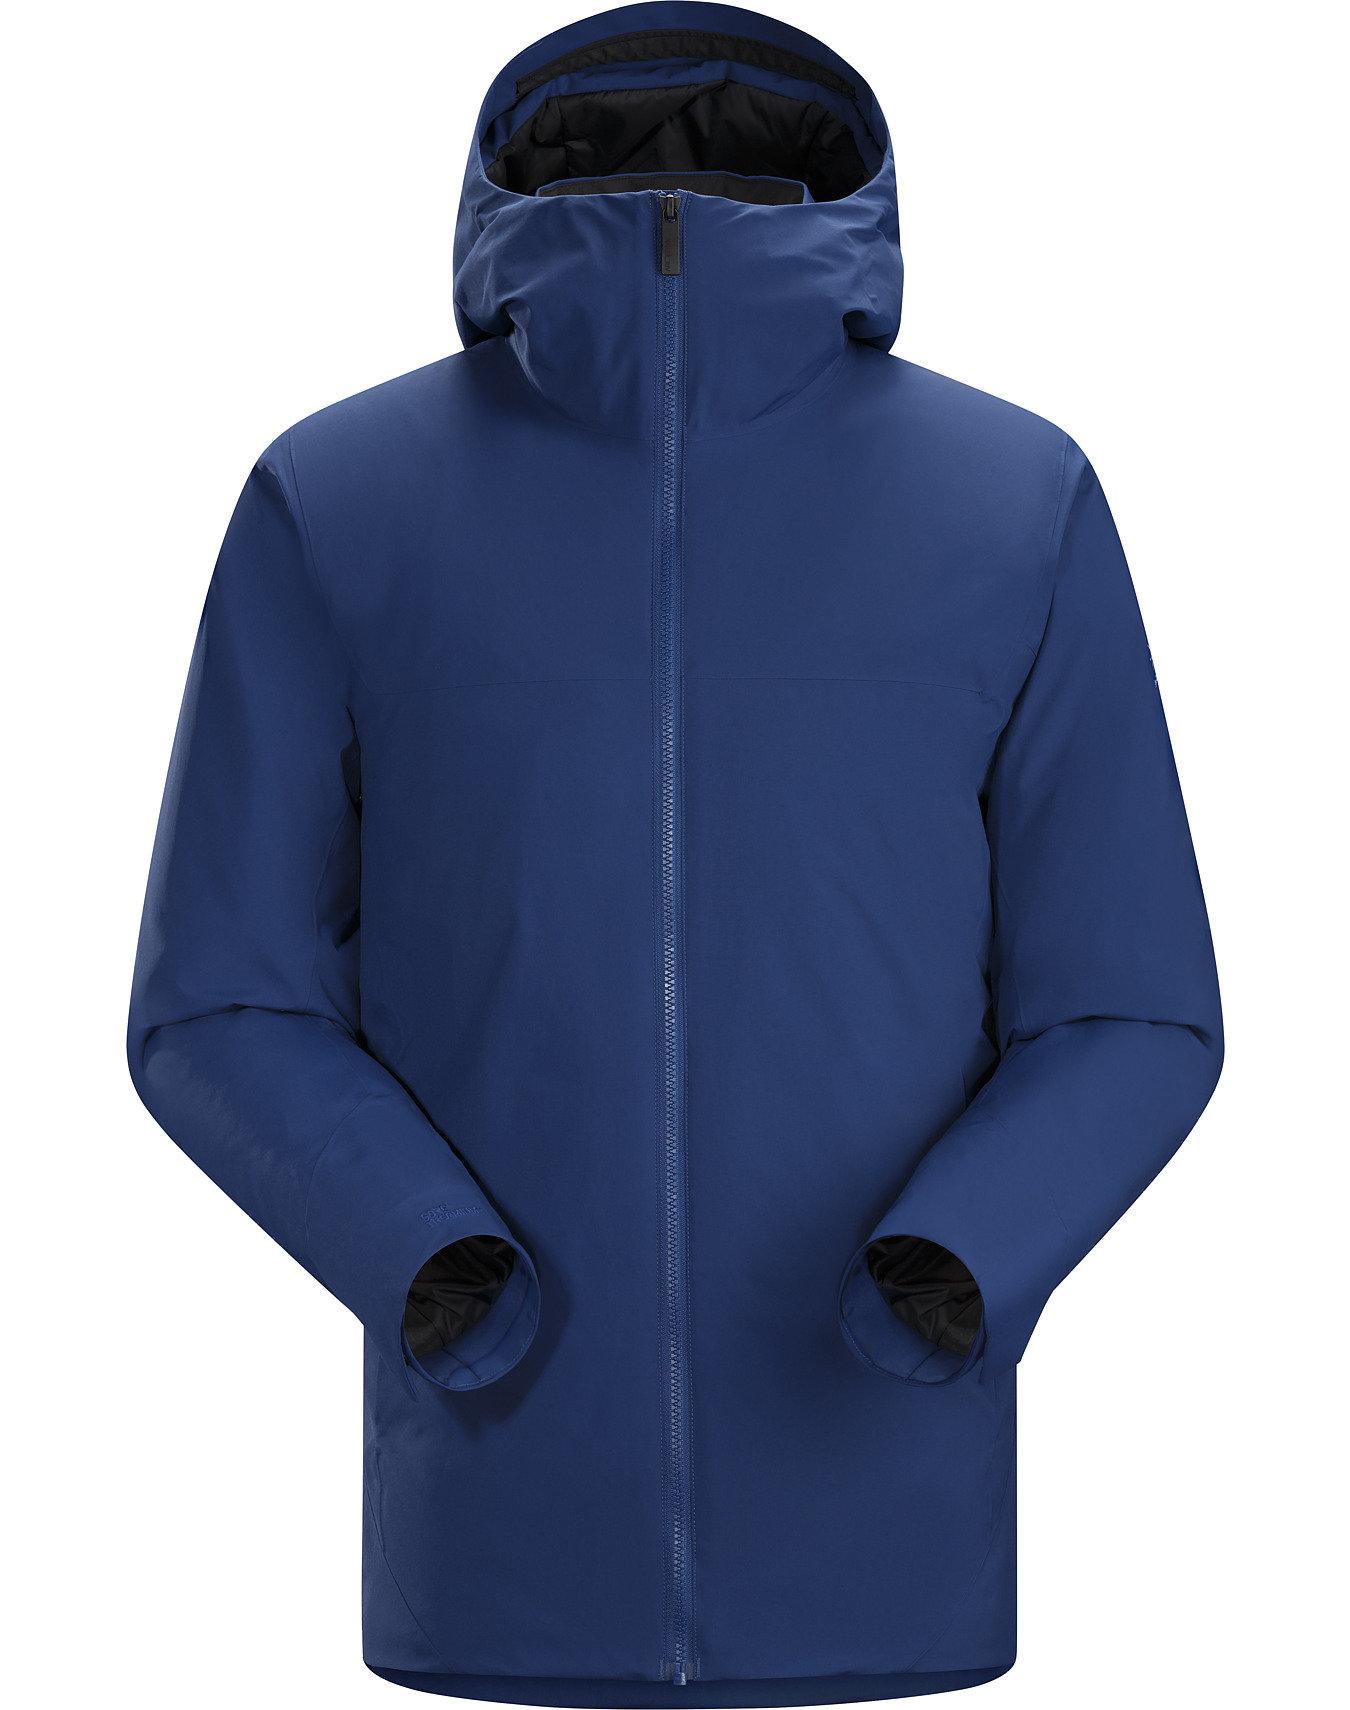 Куртка Для Активного Отдыха Arcteryx 2017-18 Koda Jacket Triton (Us:xxl)